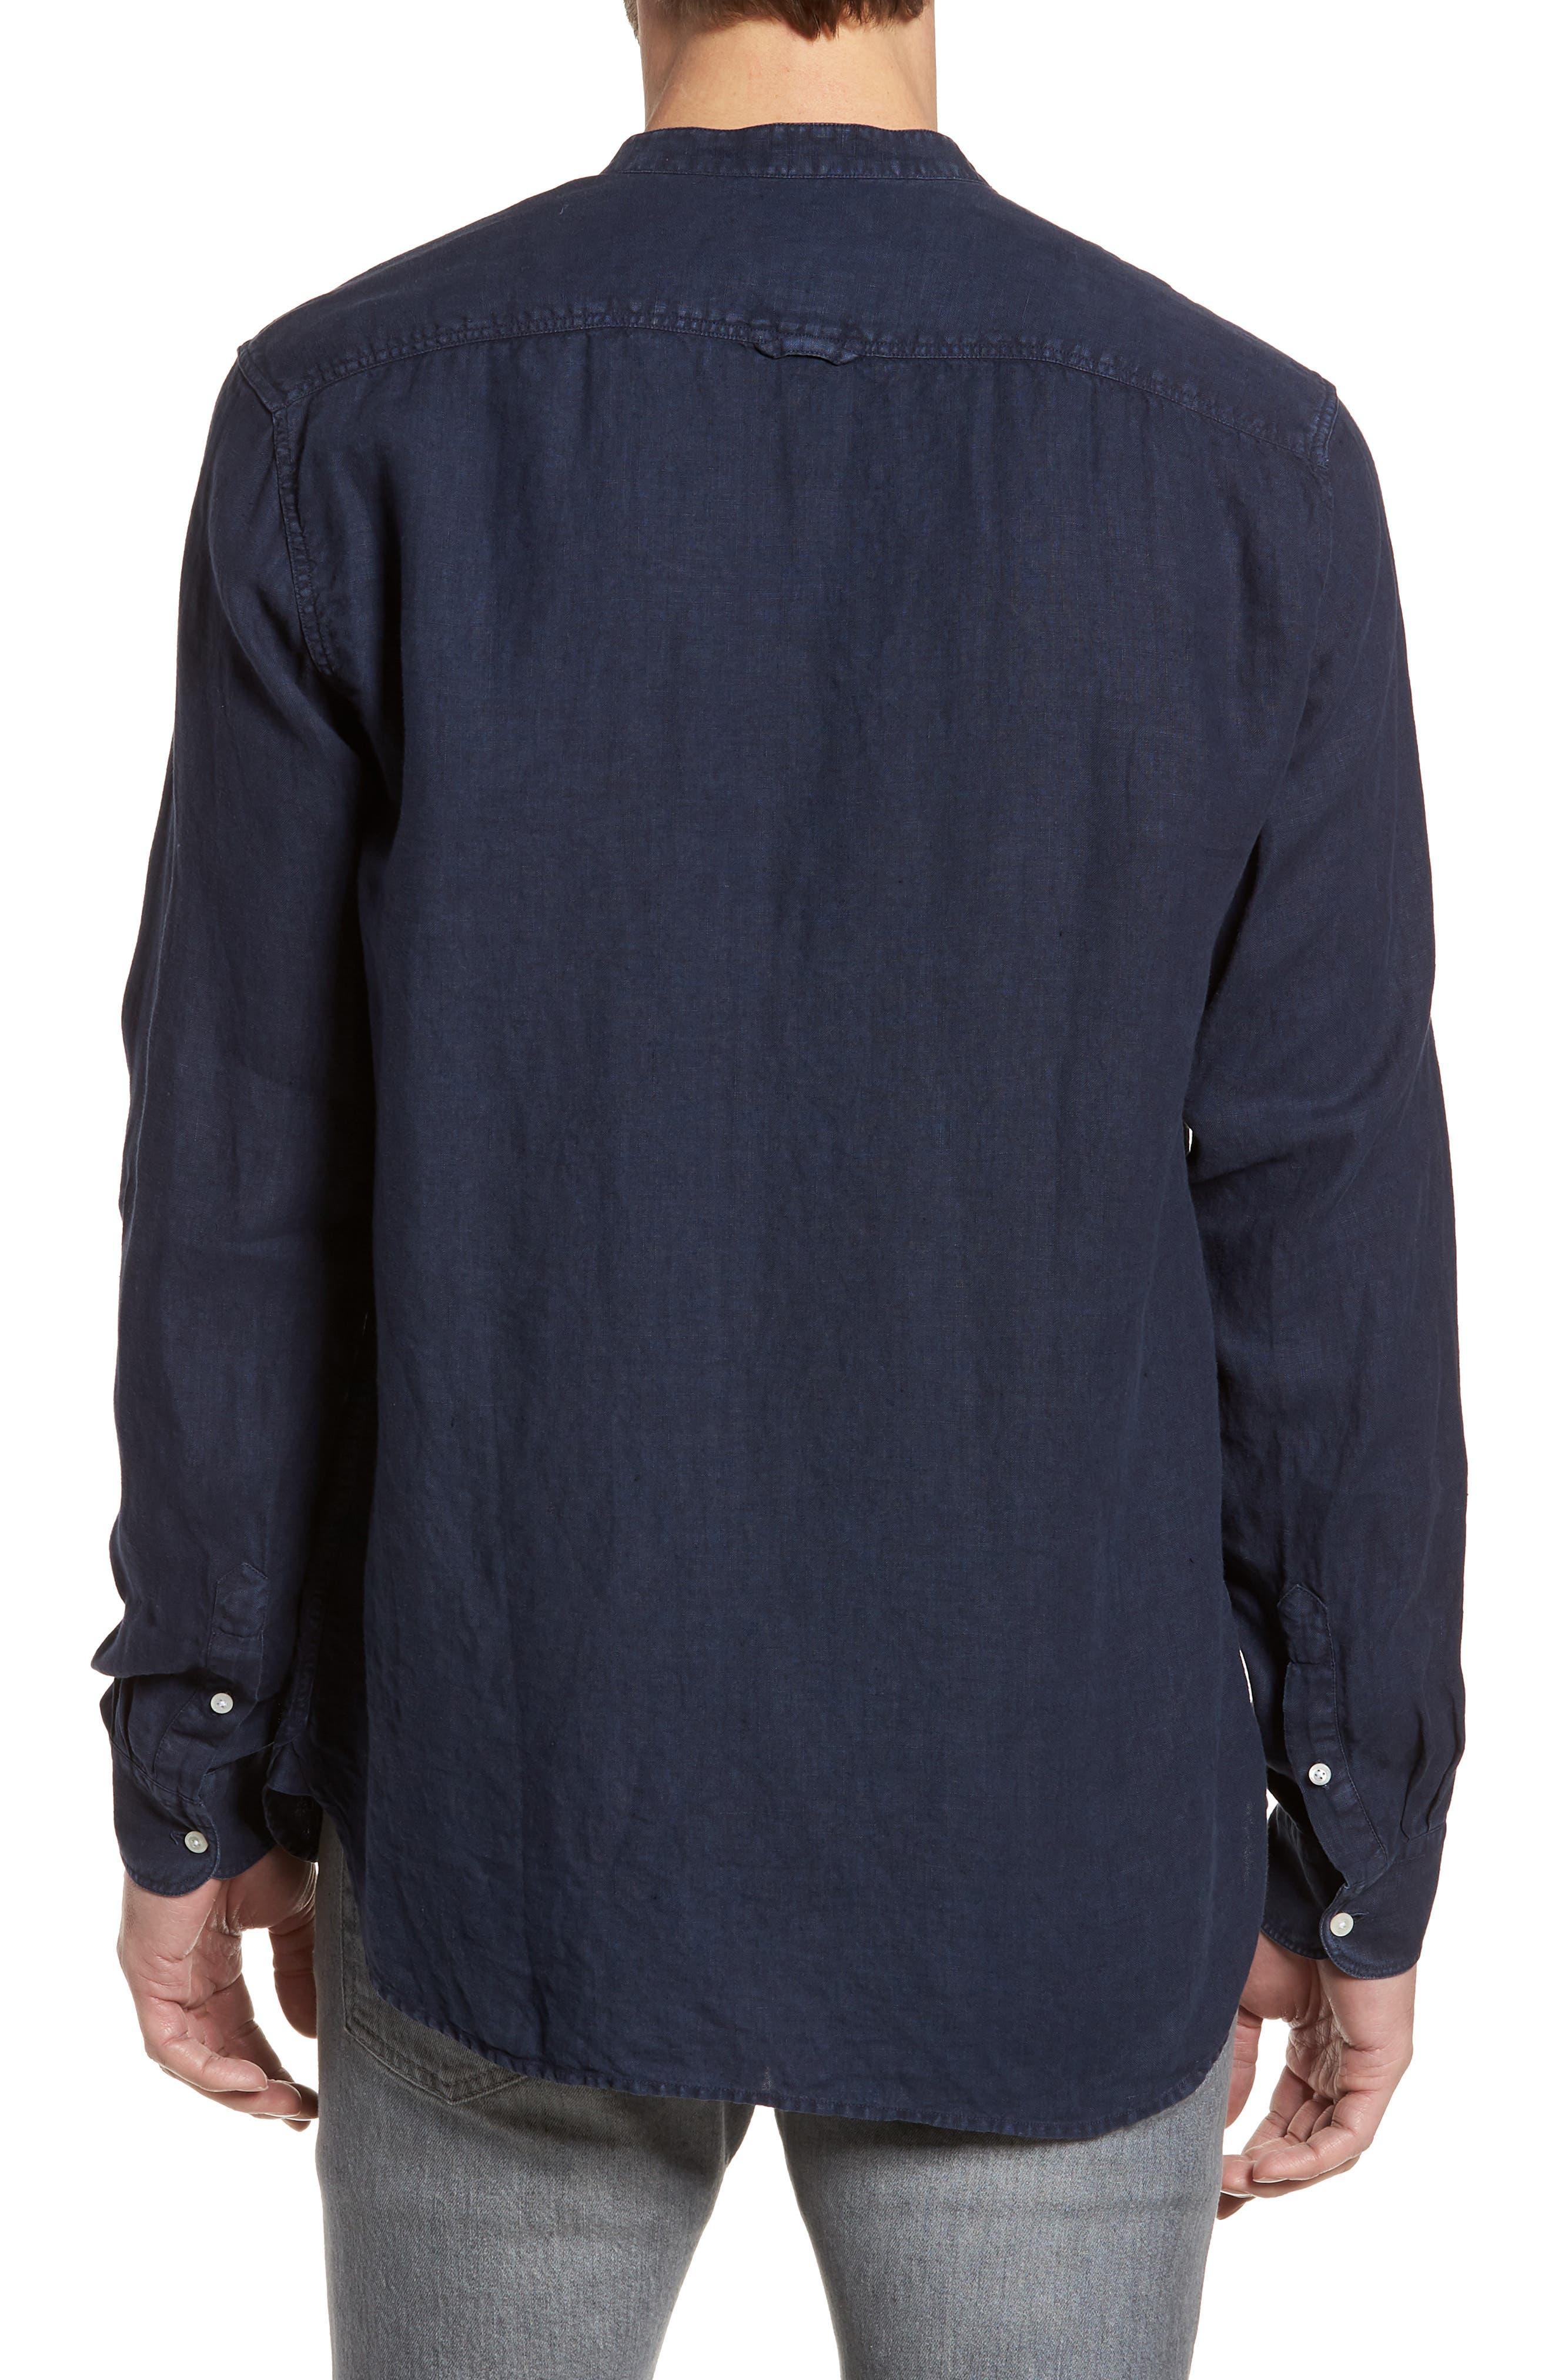 & Bros. Regular Fit Band Collar Linen Shirt,                             Alternate thumbnail 2, color,                             477